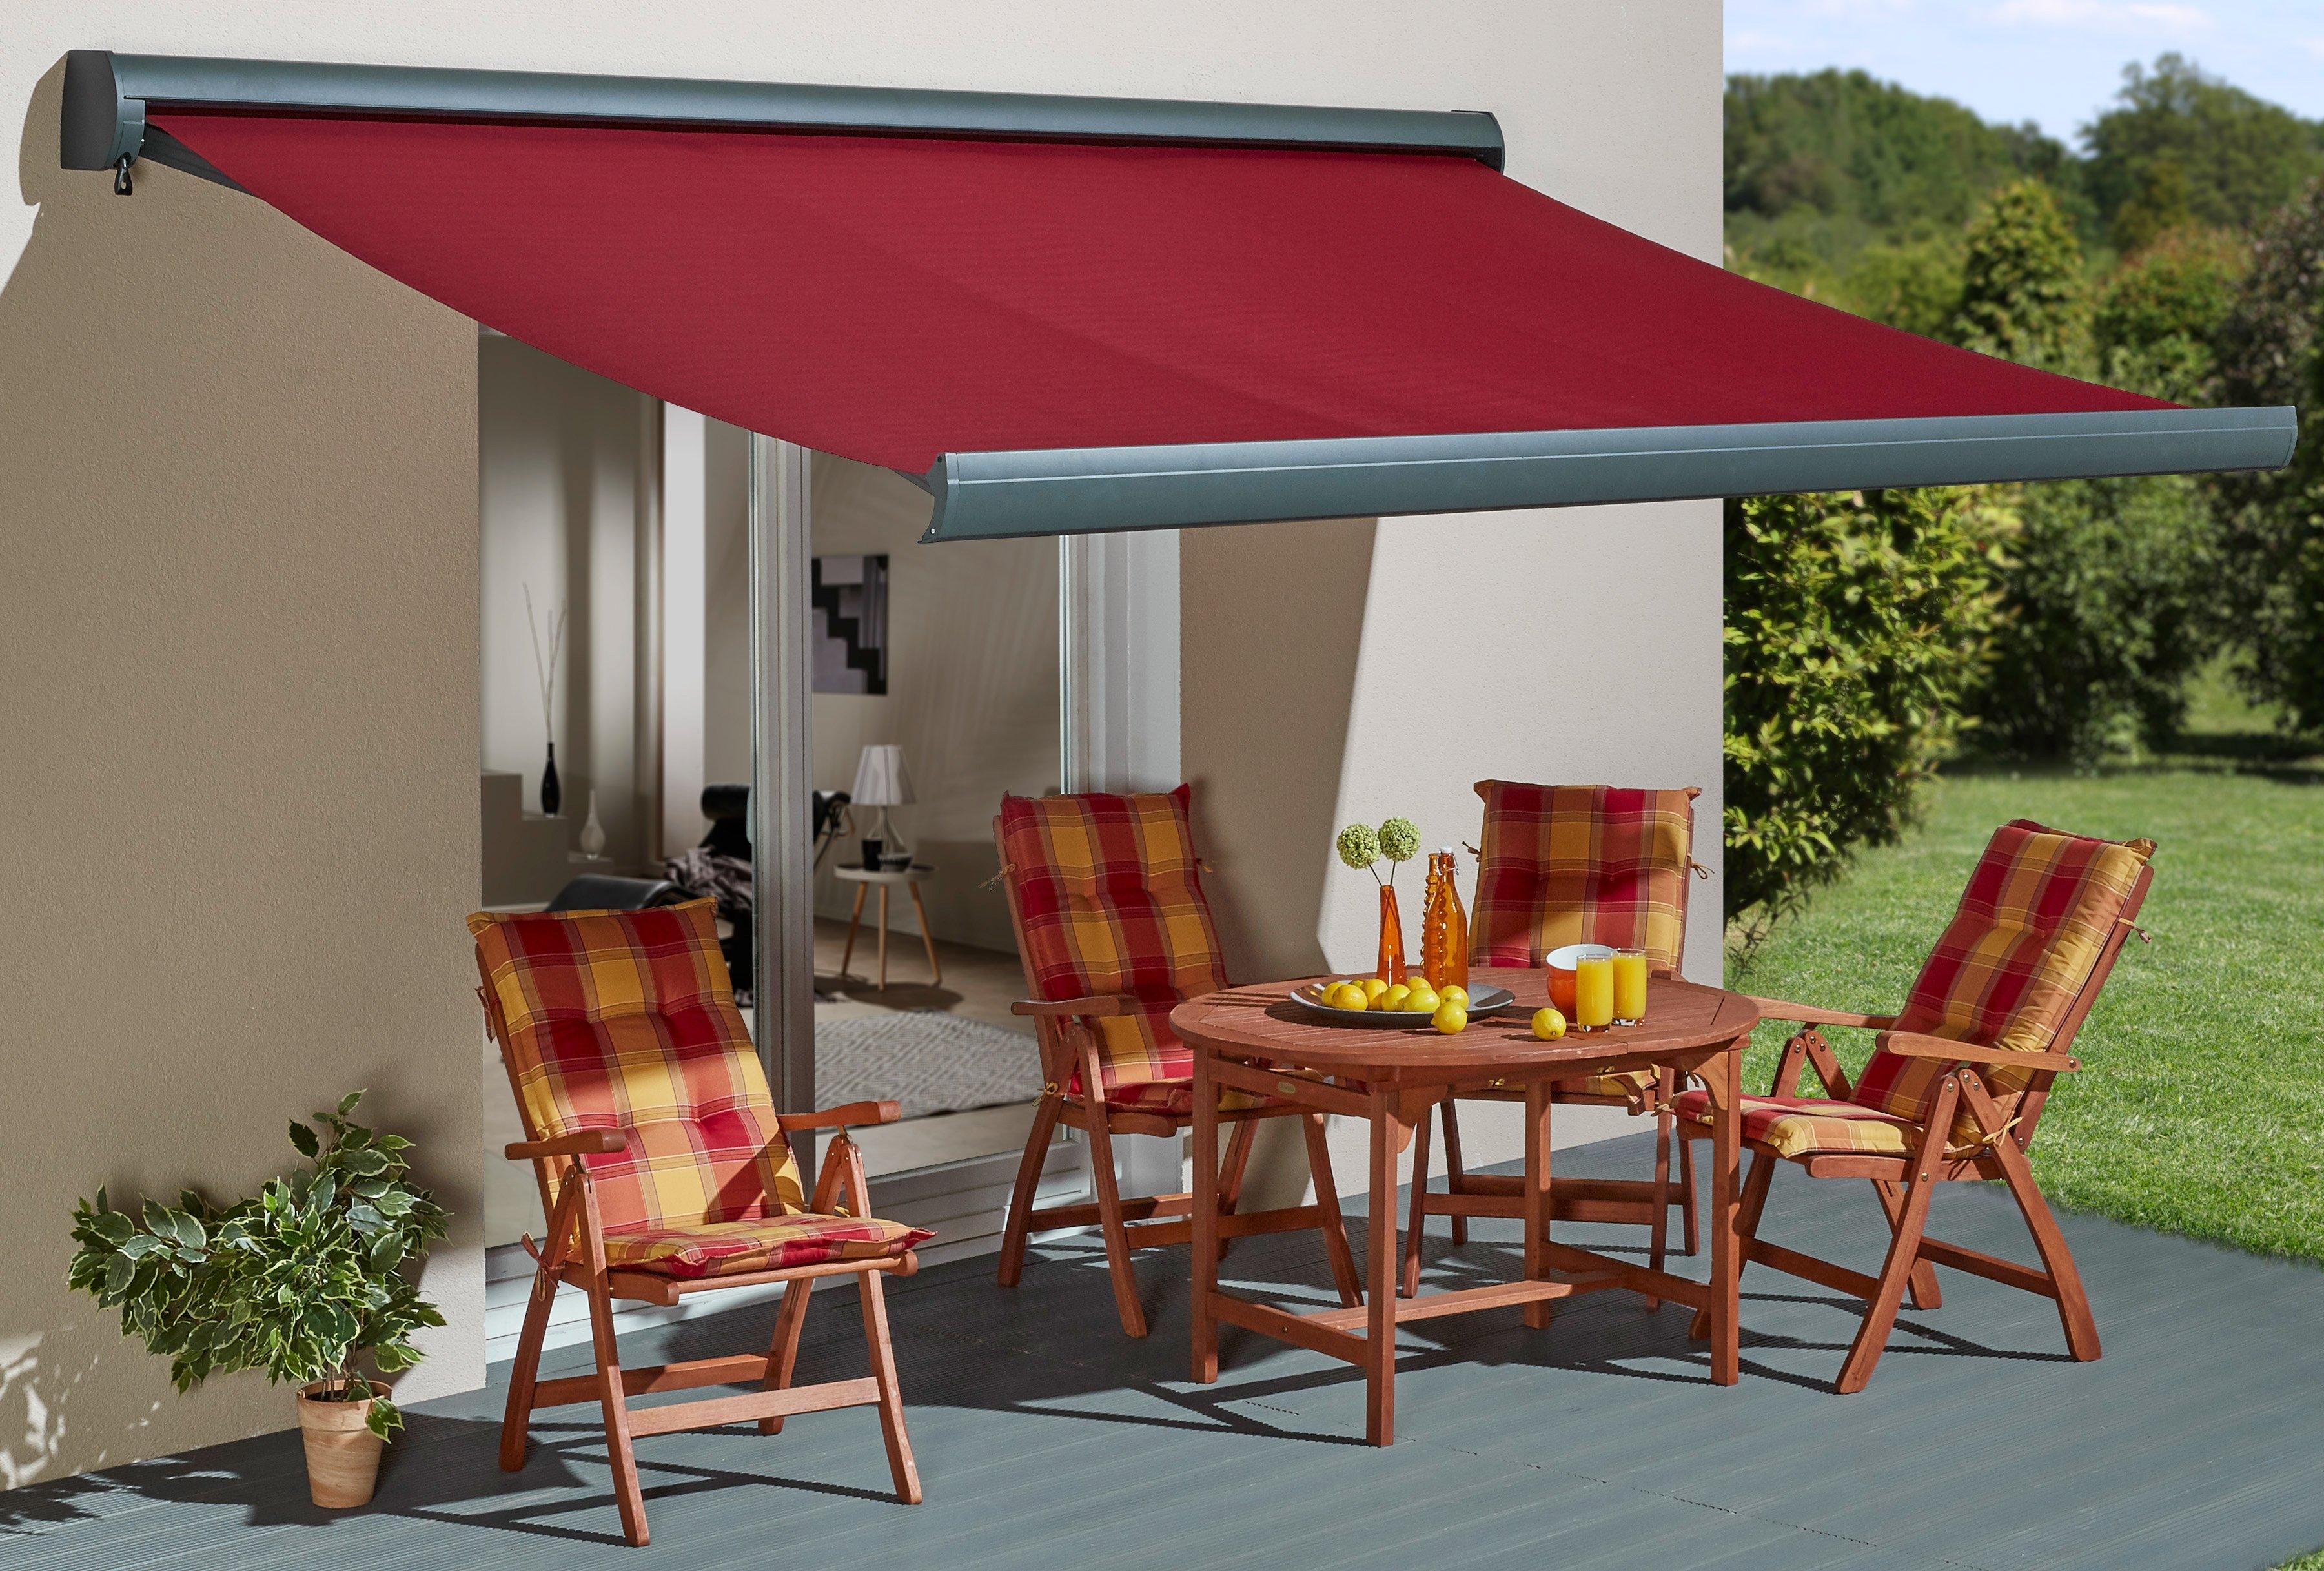 zonneschermen kopen bestel jouw zonnescherm vanaf 89 99 otto. Black Bedroom Furniture Sets. Home Design Ideas